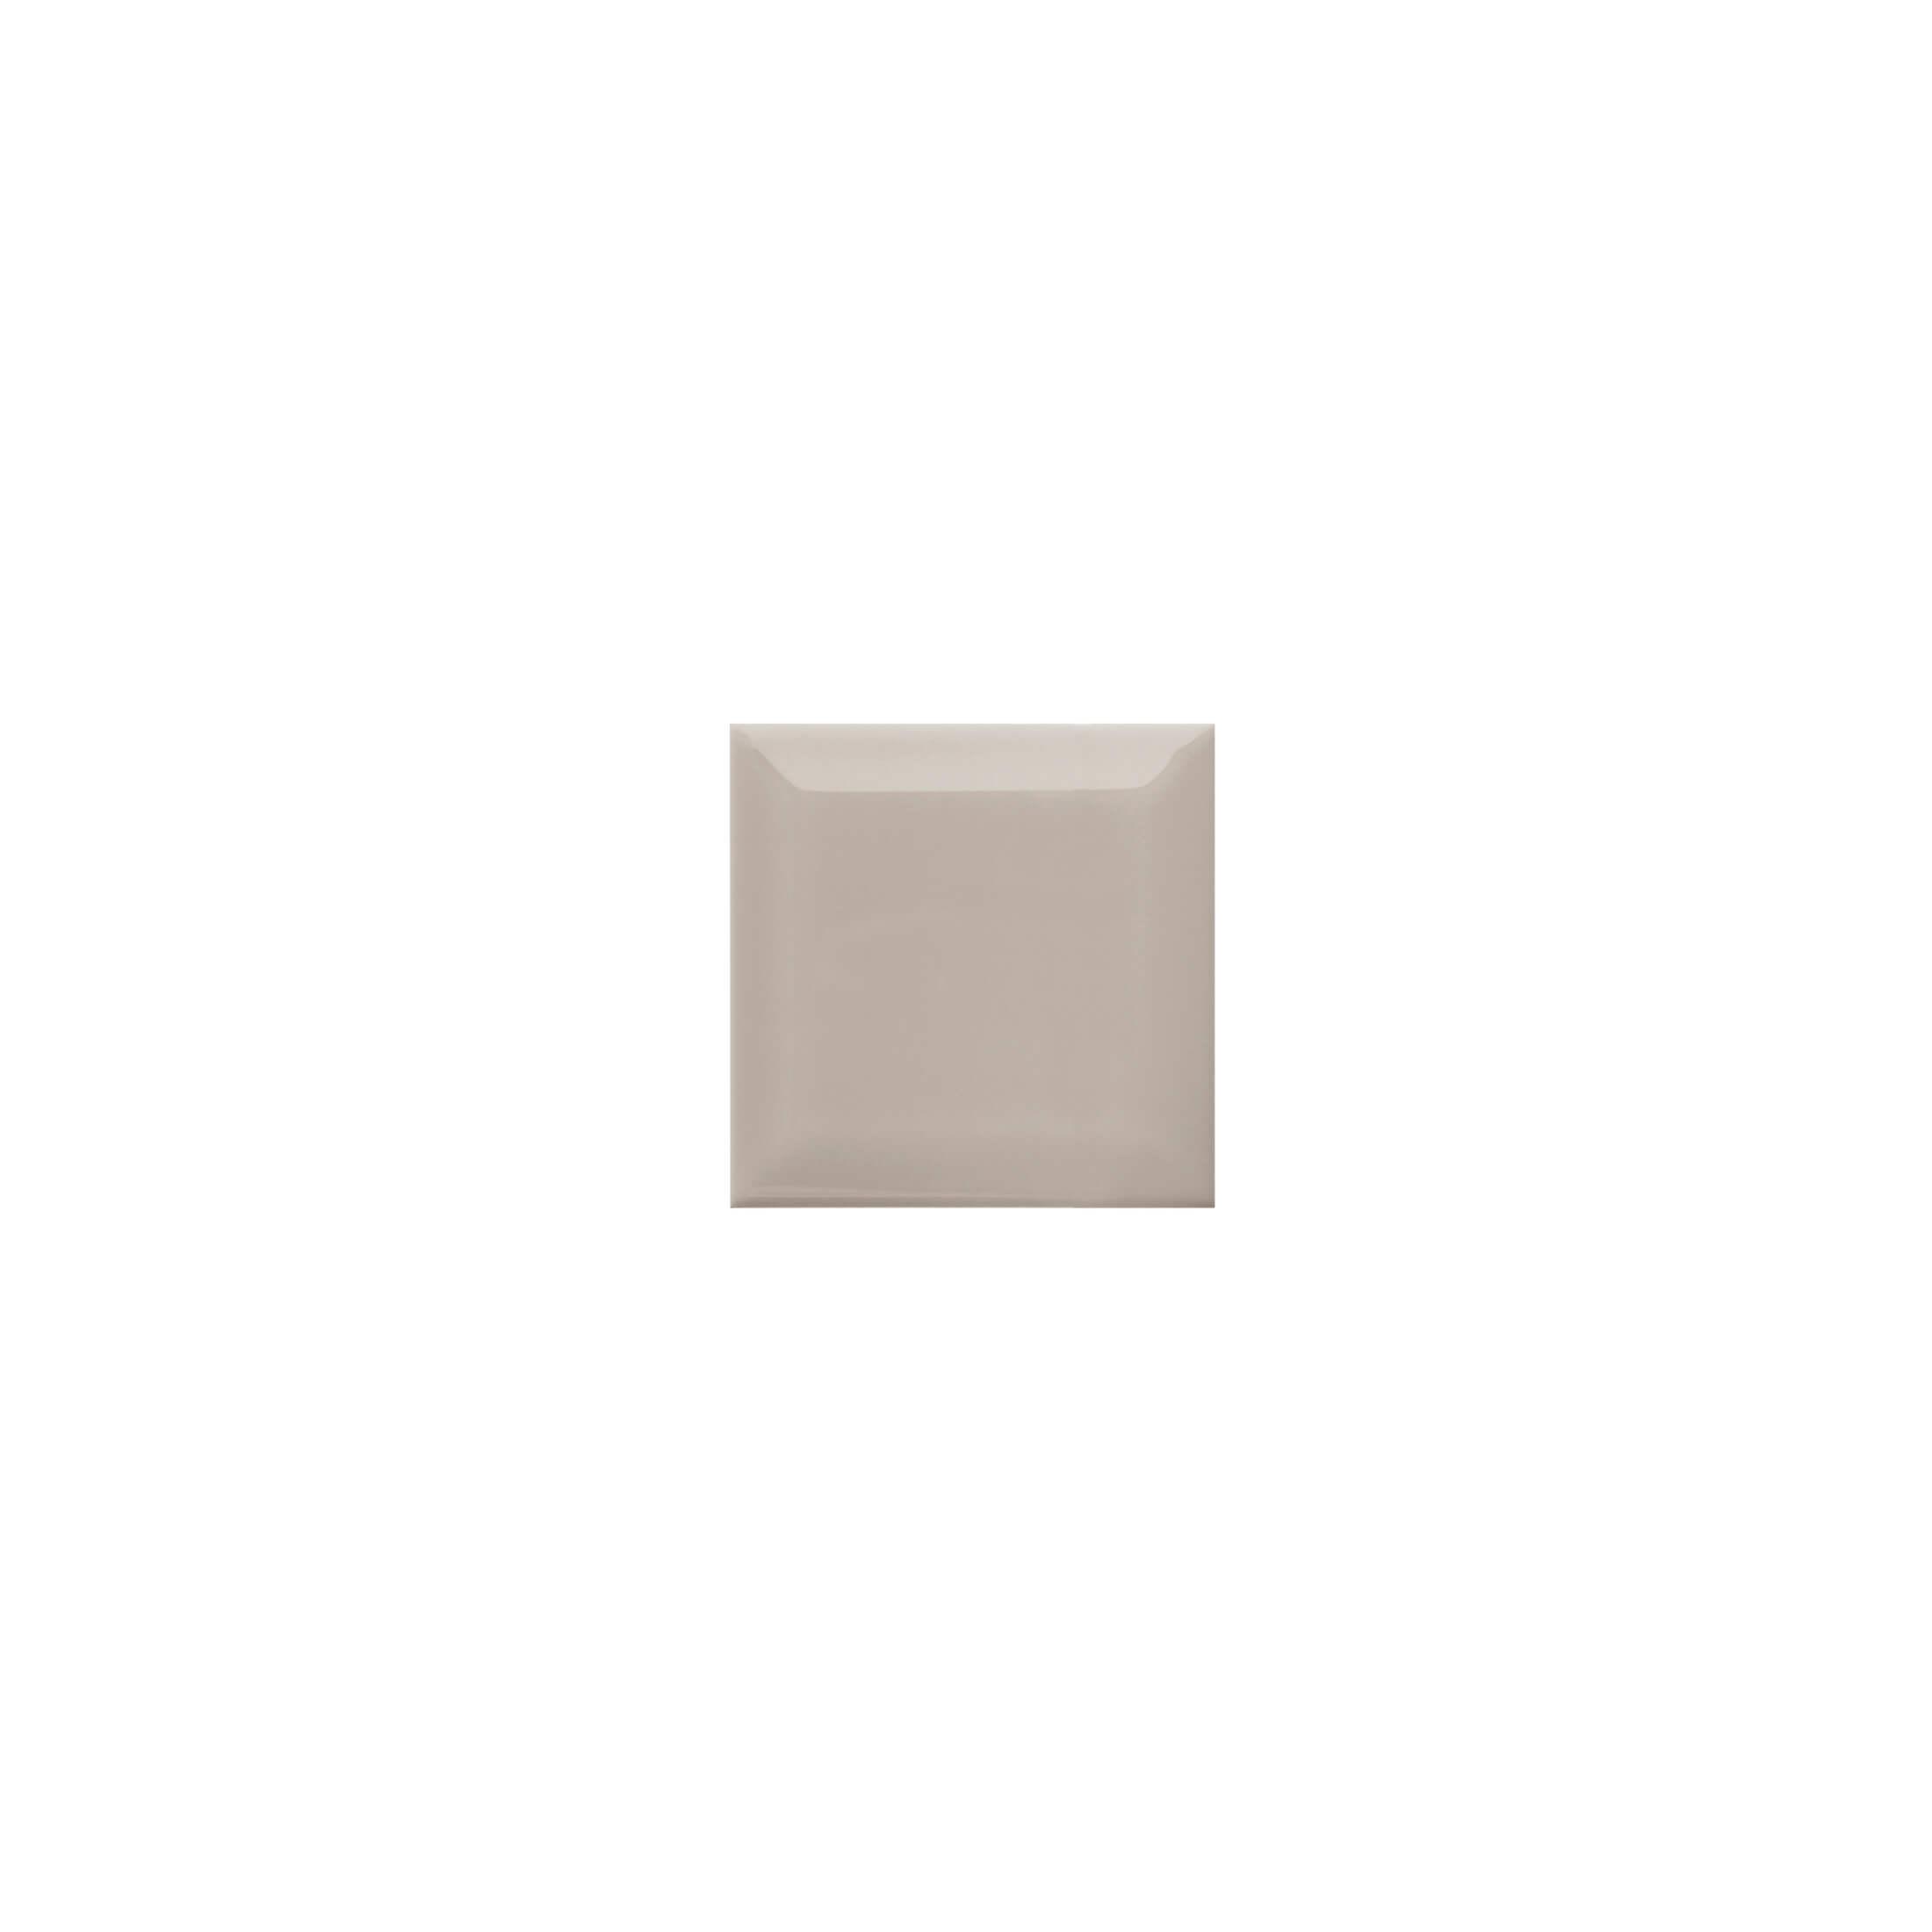 ADNE5567 - BISELADO PB - 7.5 cm X 7.5 cm